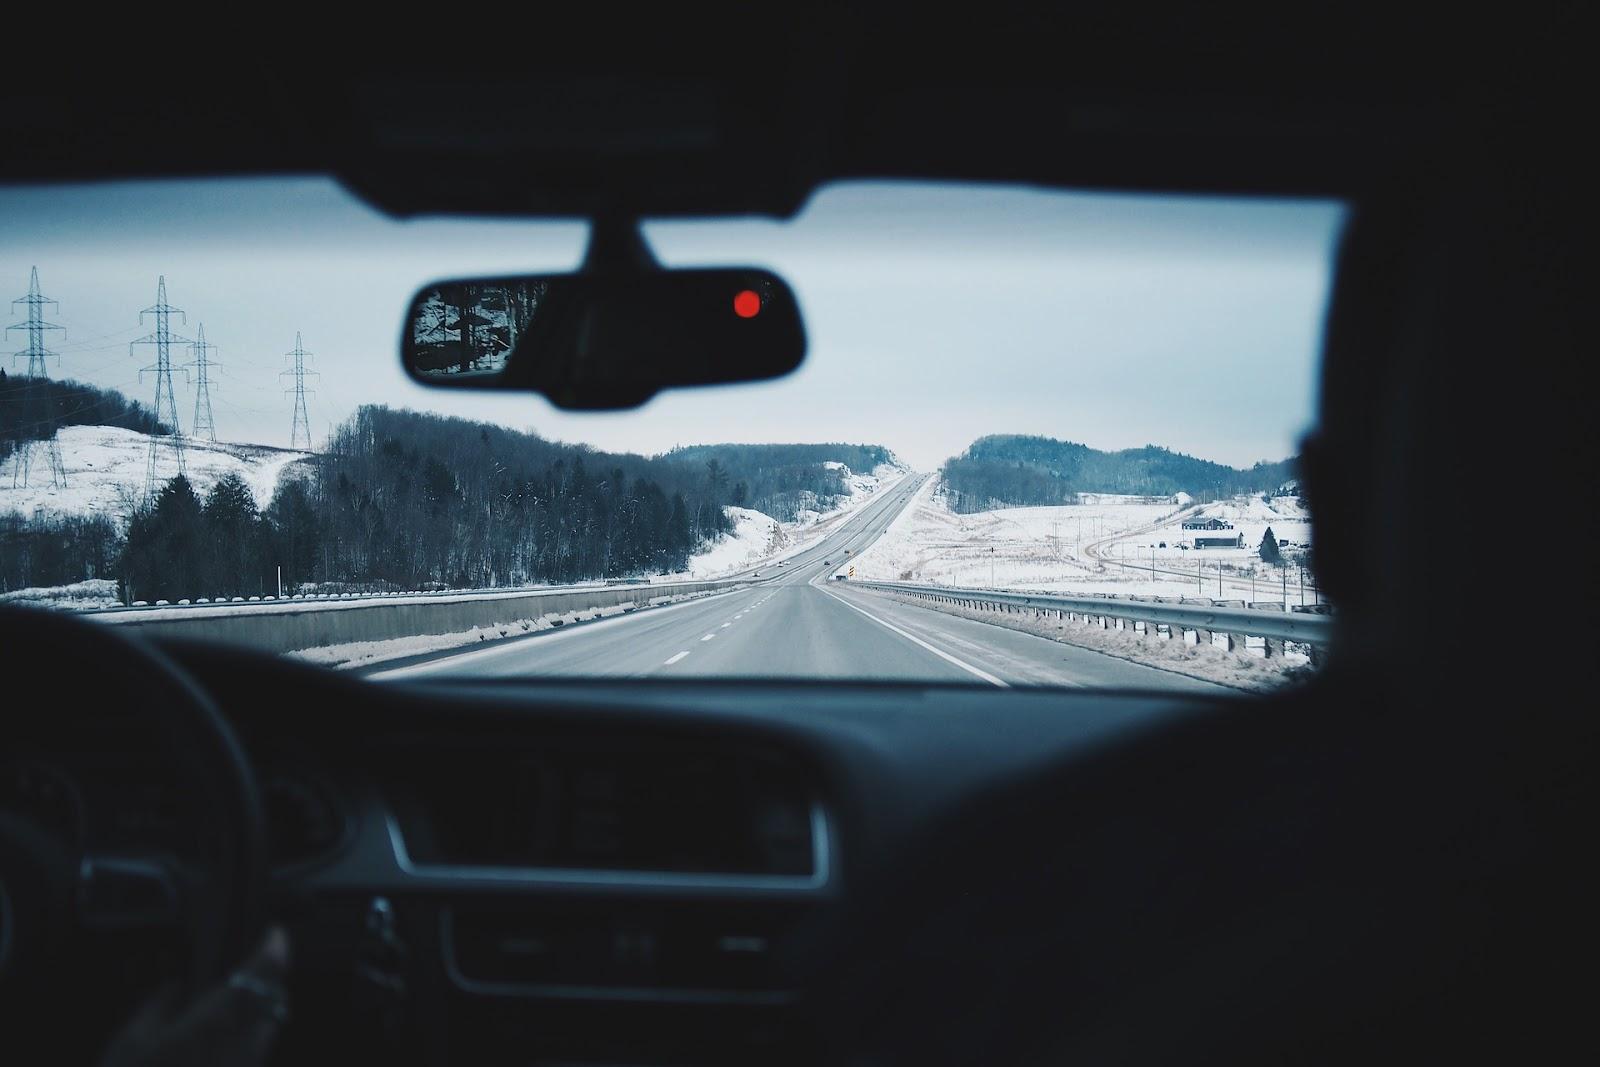 driving-916405_1920.jpg